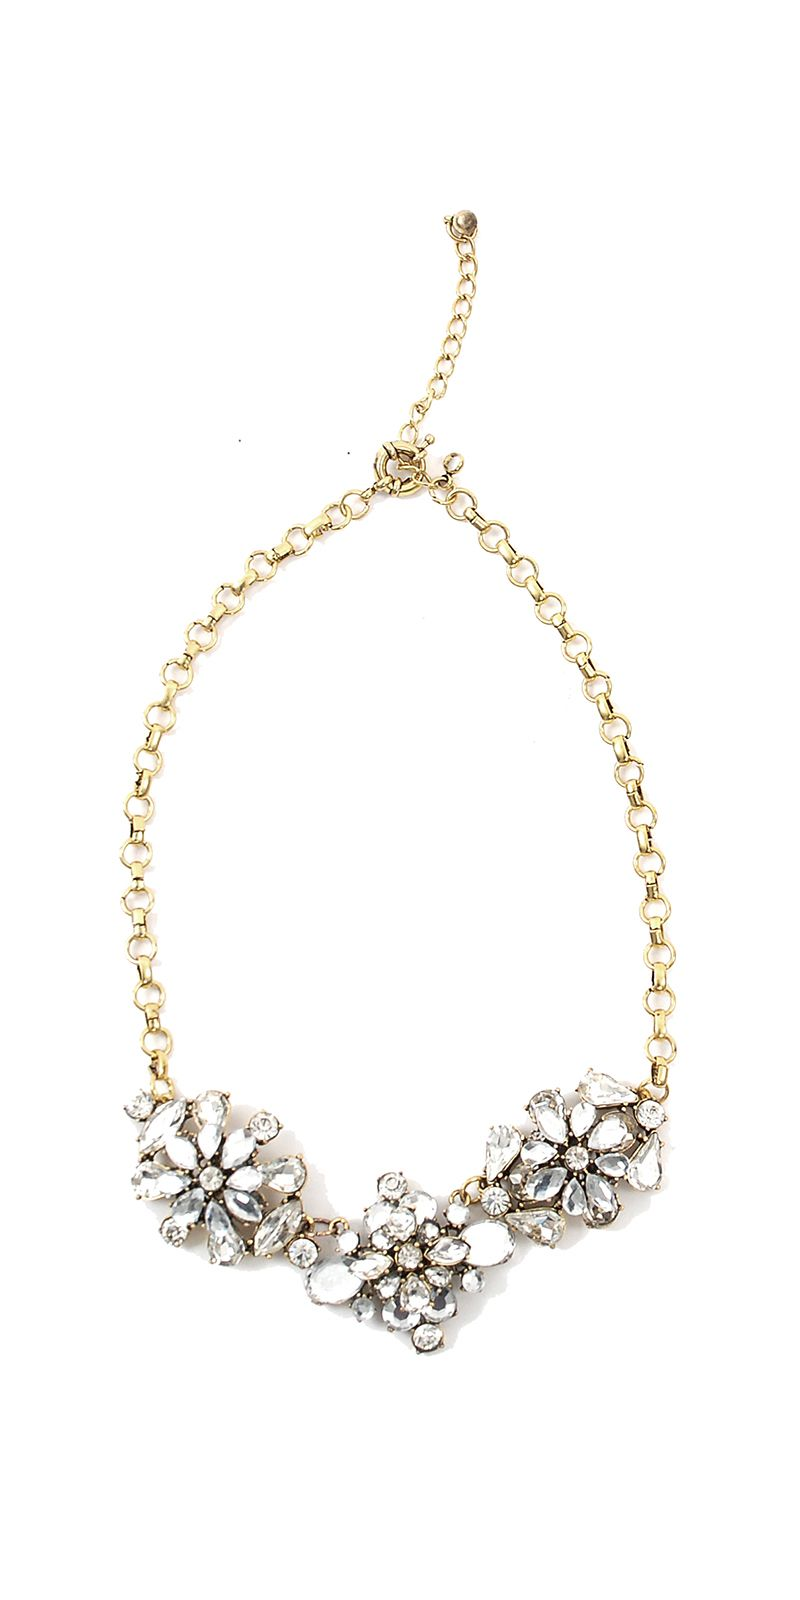 Firelight Bejewel Necklace